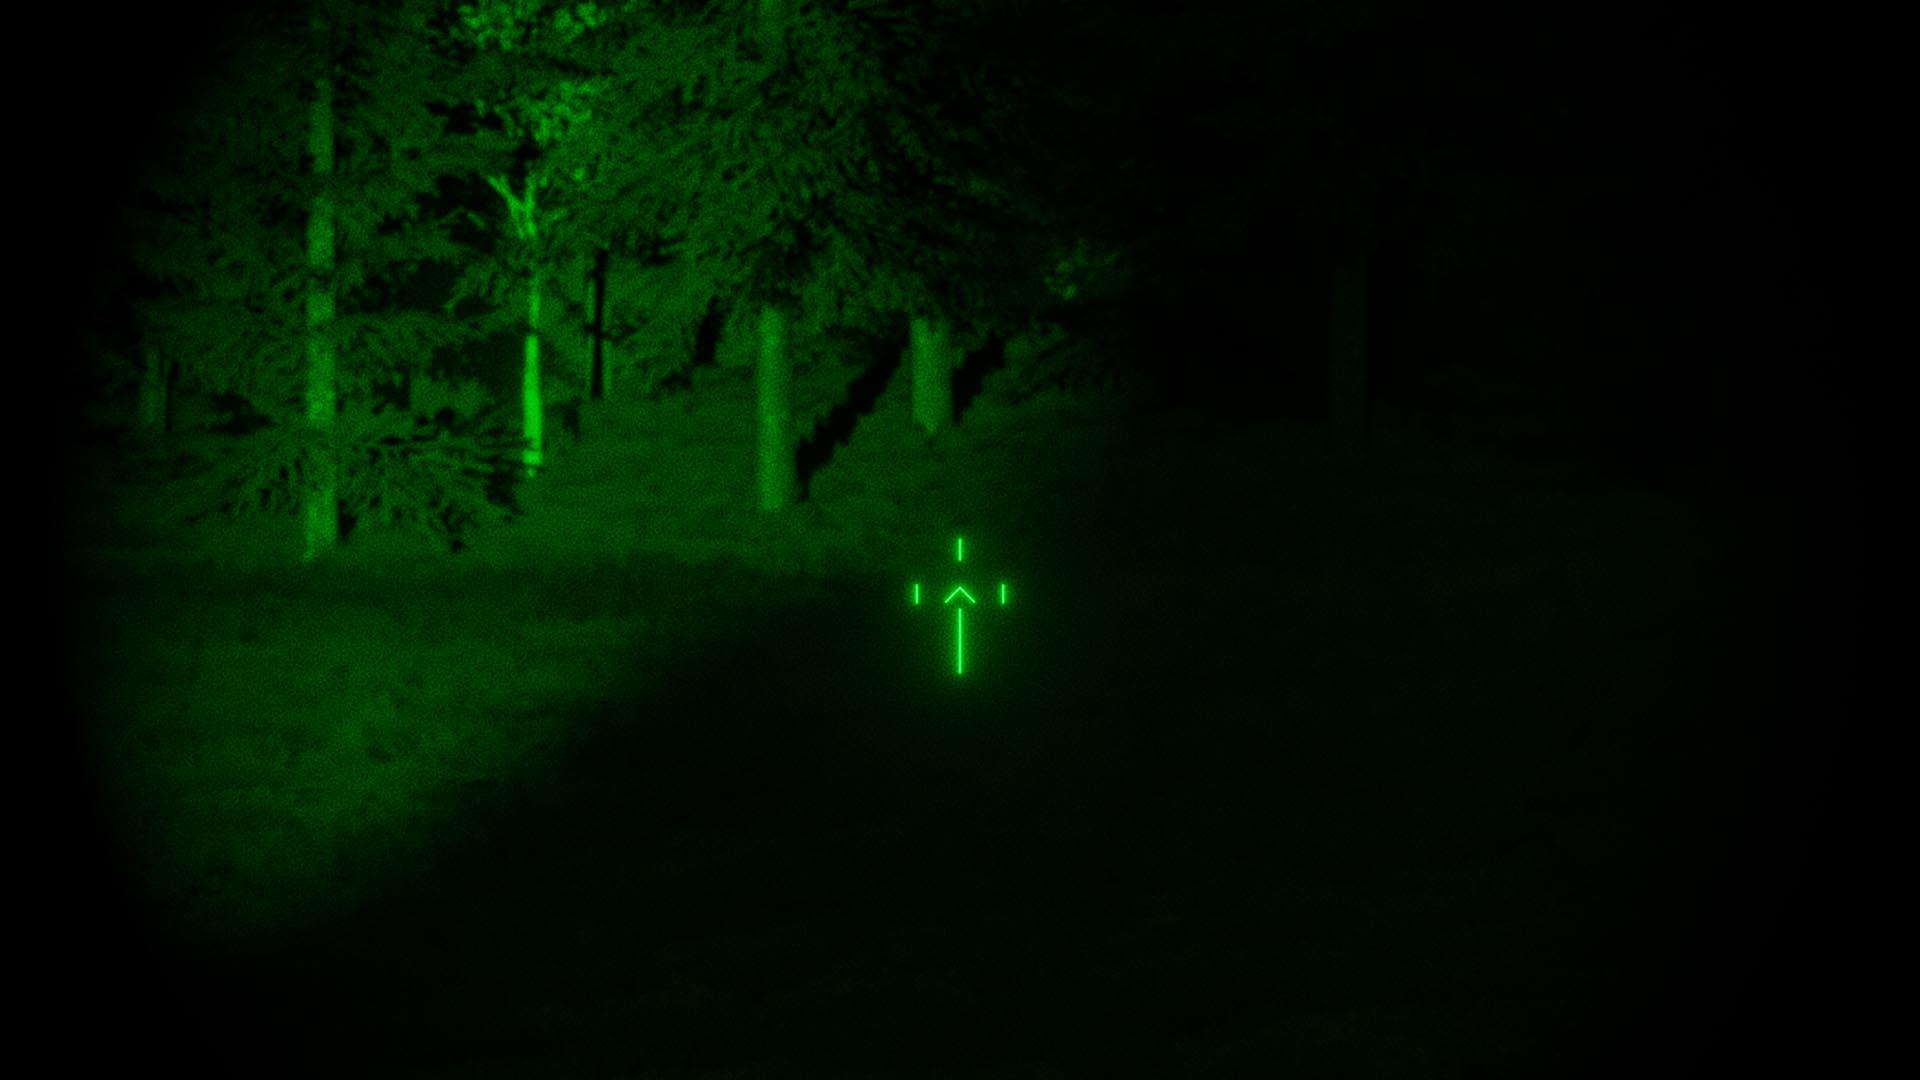 Tag team illumination